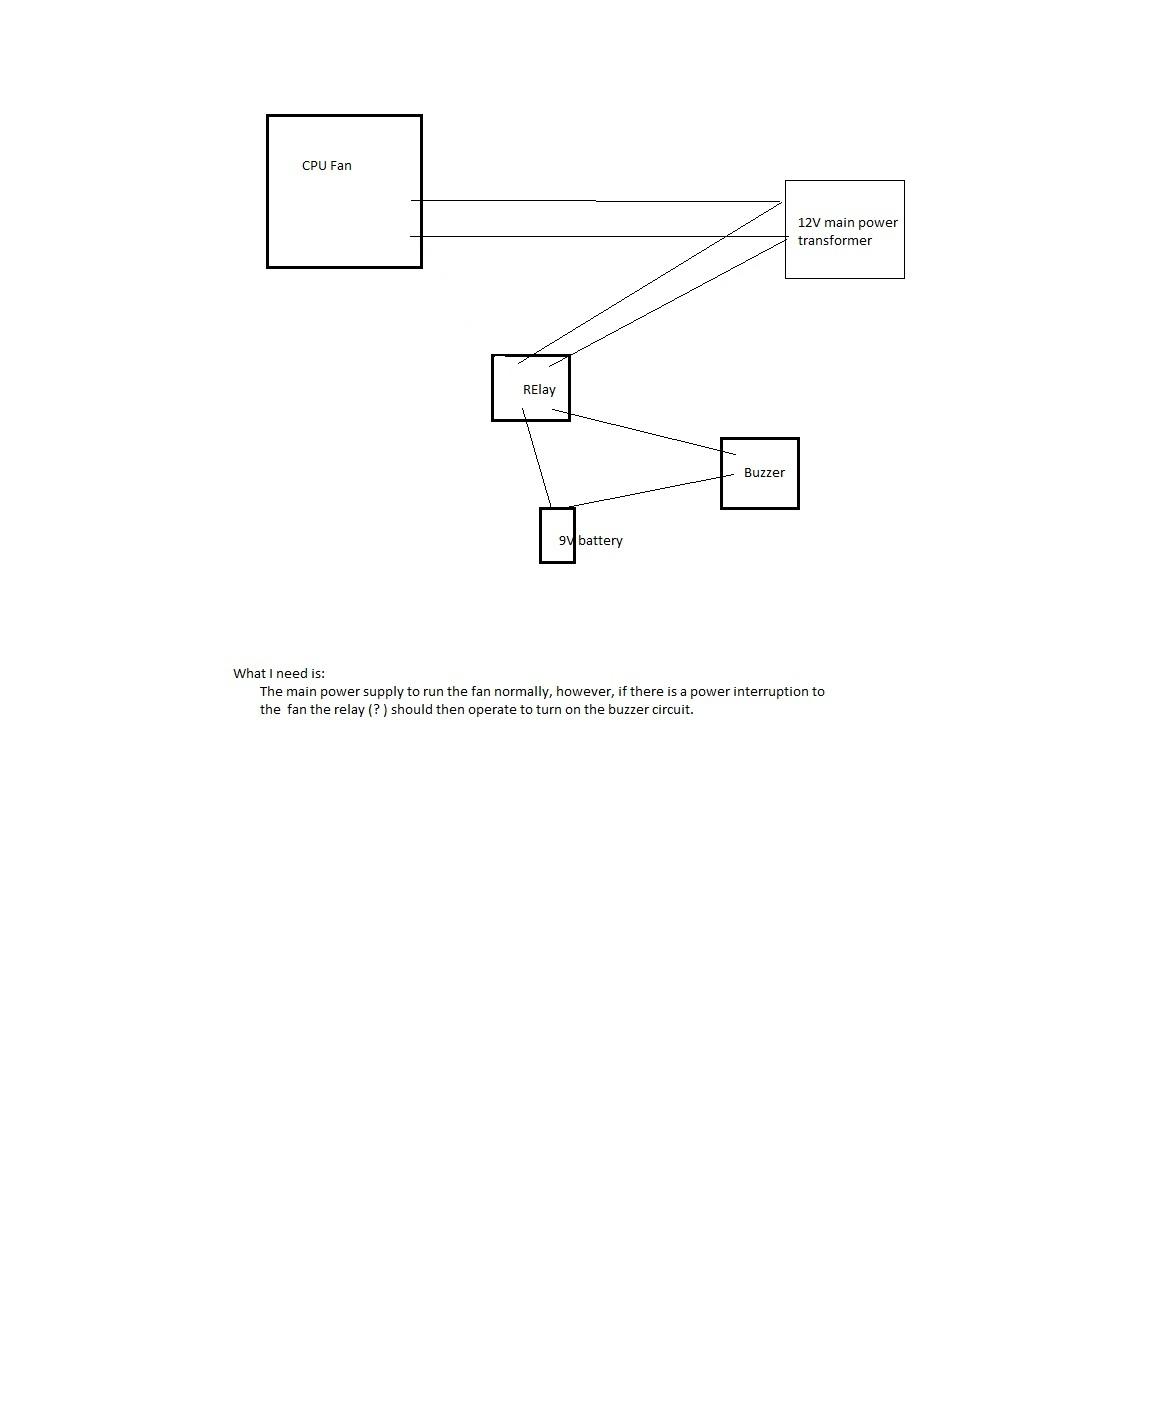 23386d1280801036 12v power supply failure alarm alarm circuit 12v power supply failure alarm electrical diy chatroom home